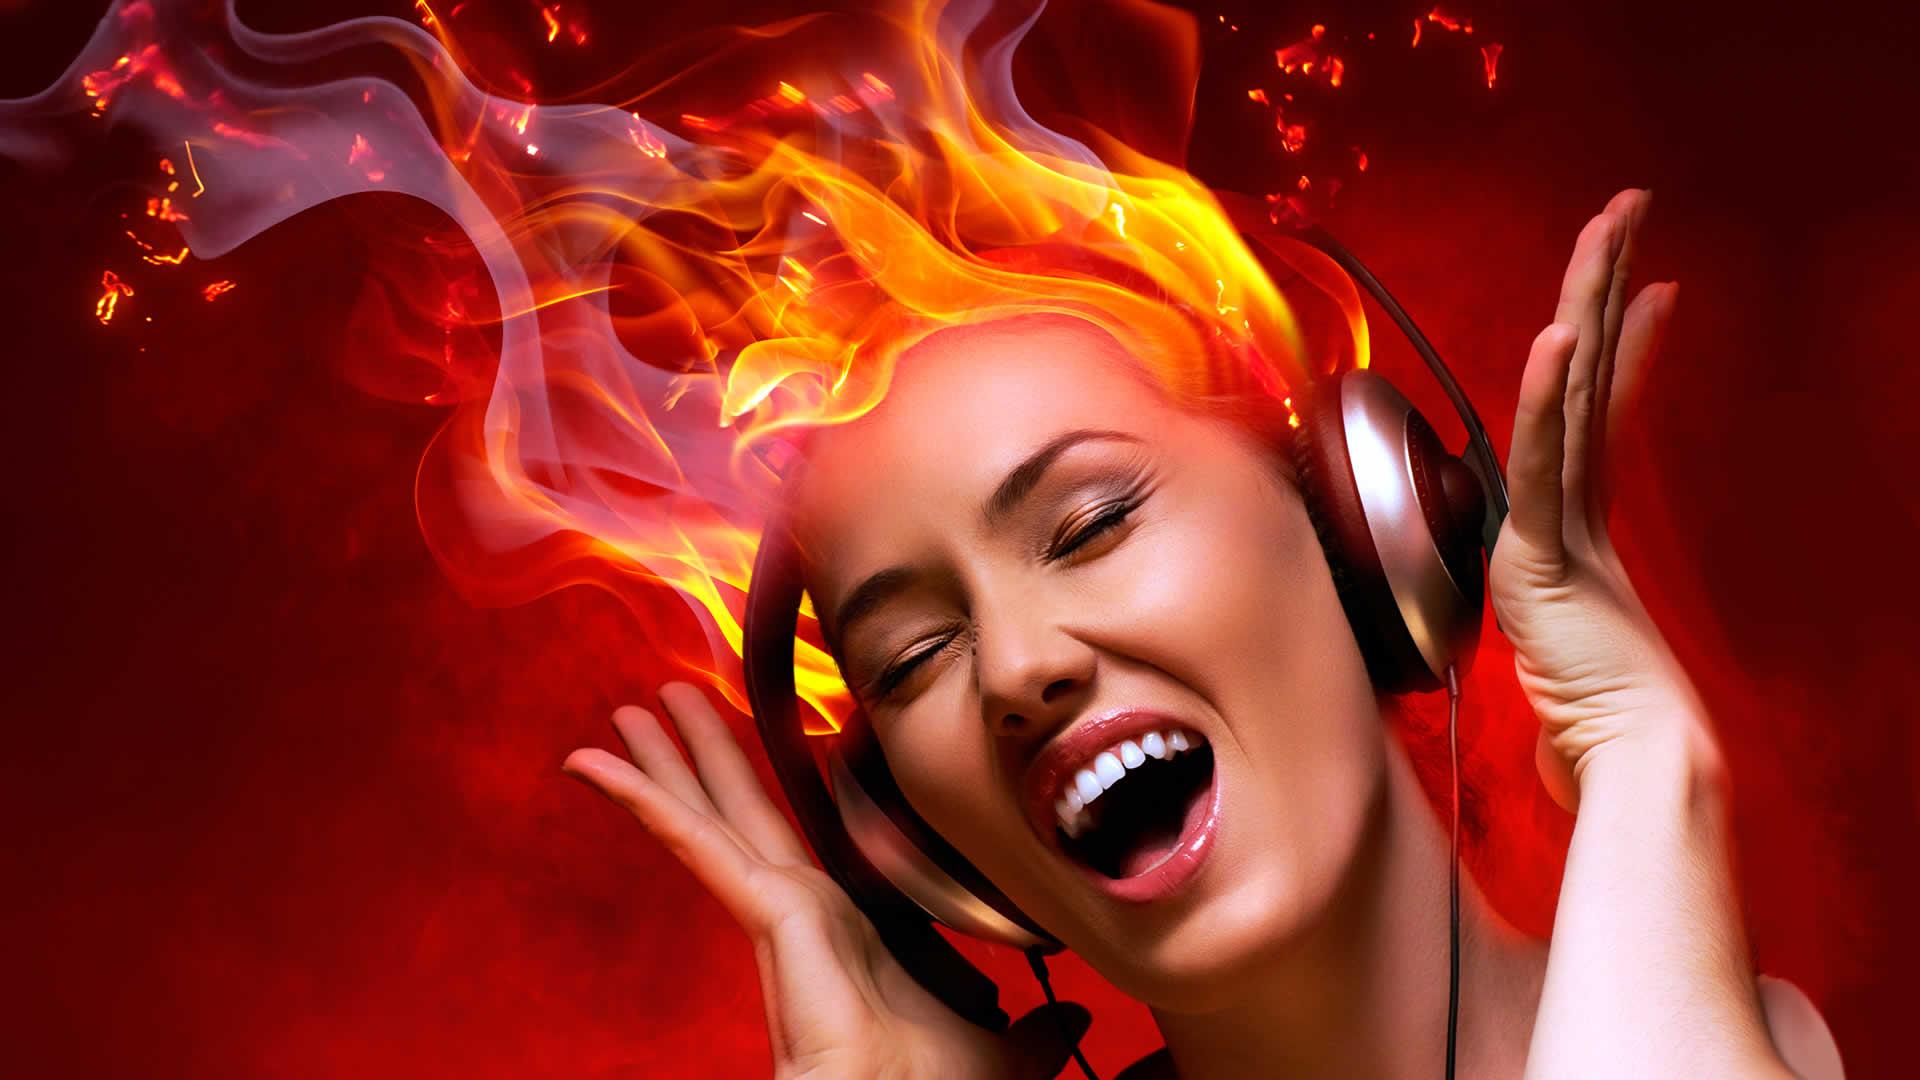 Chocolate Radio The Global Soul, Jazz Funk, R&B Soulful House & Reggae Music 24/7 Radio Station